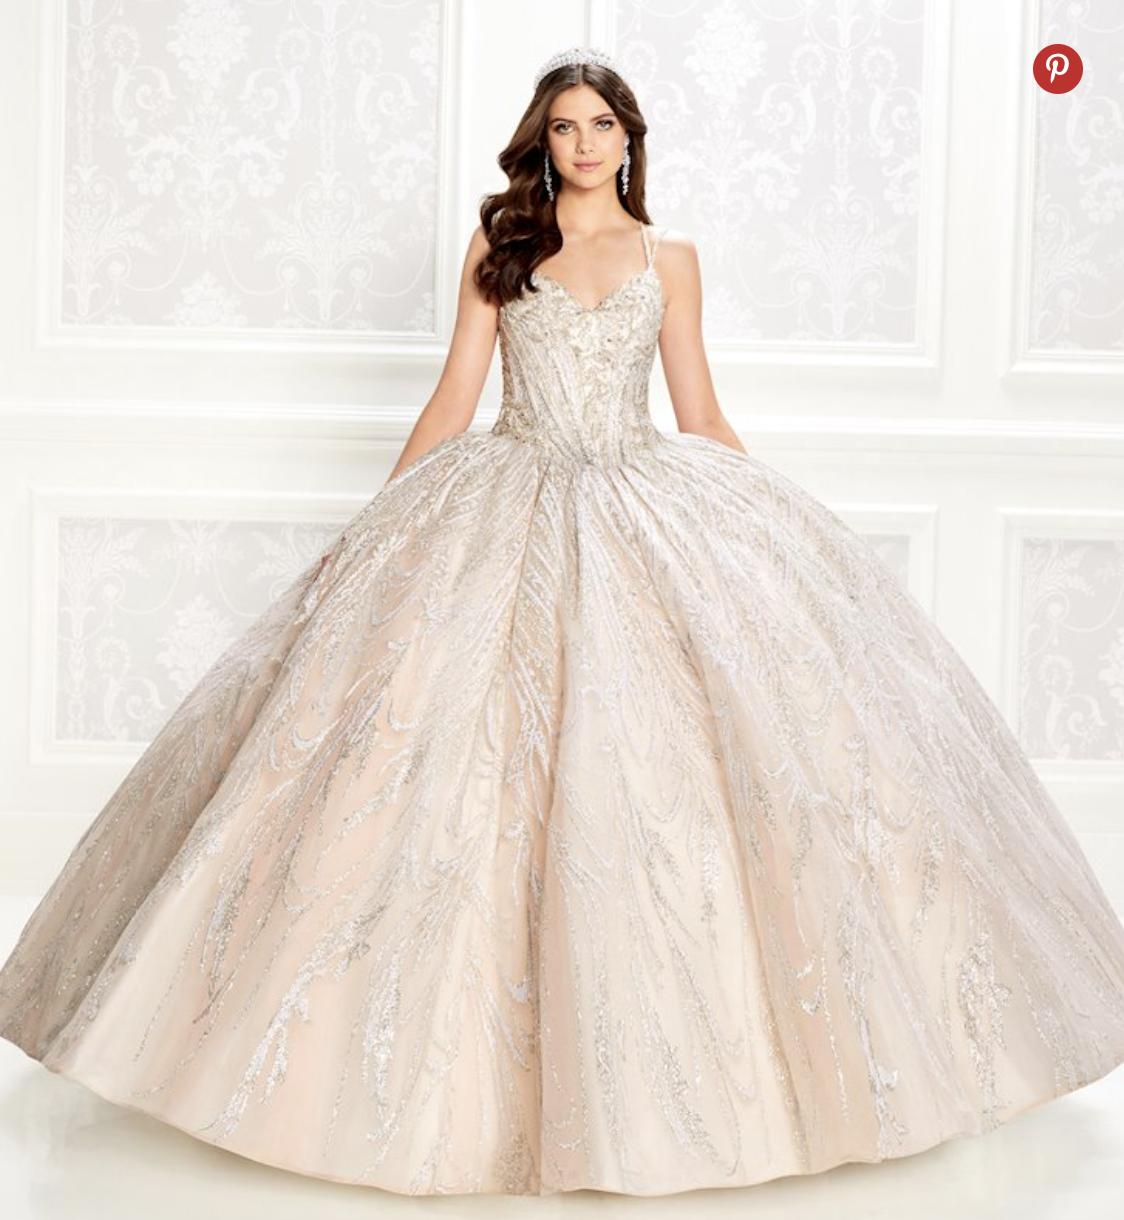 Princesa By Ariana Vara PR22031